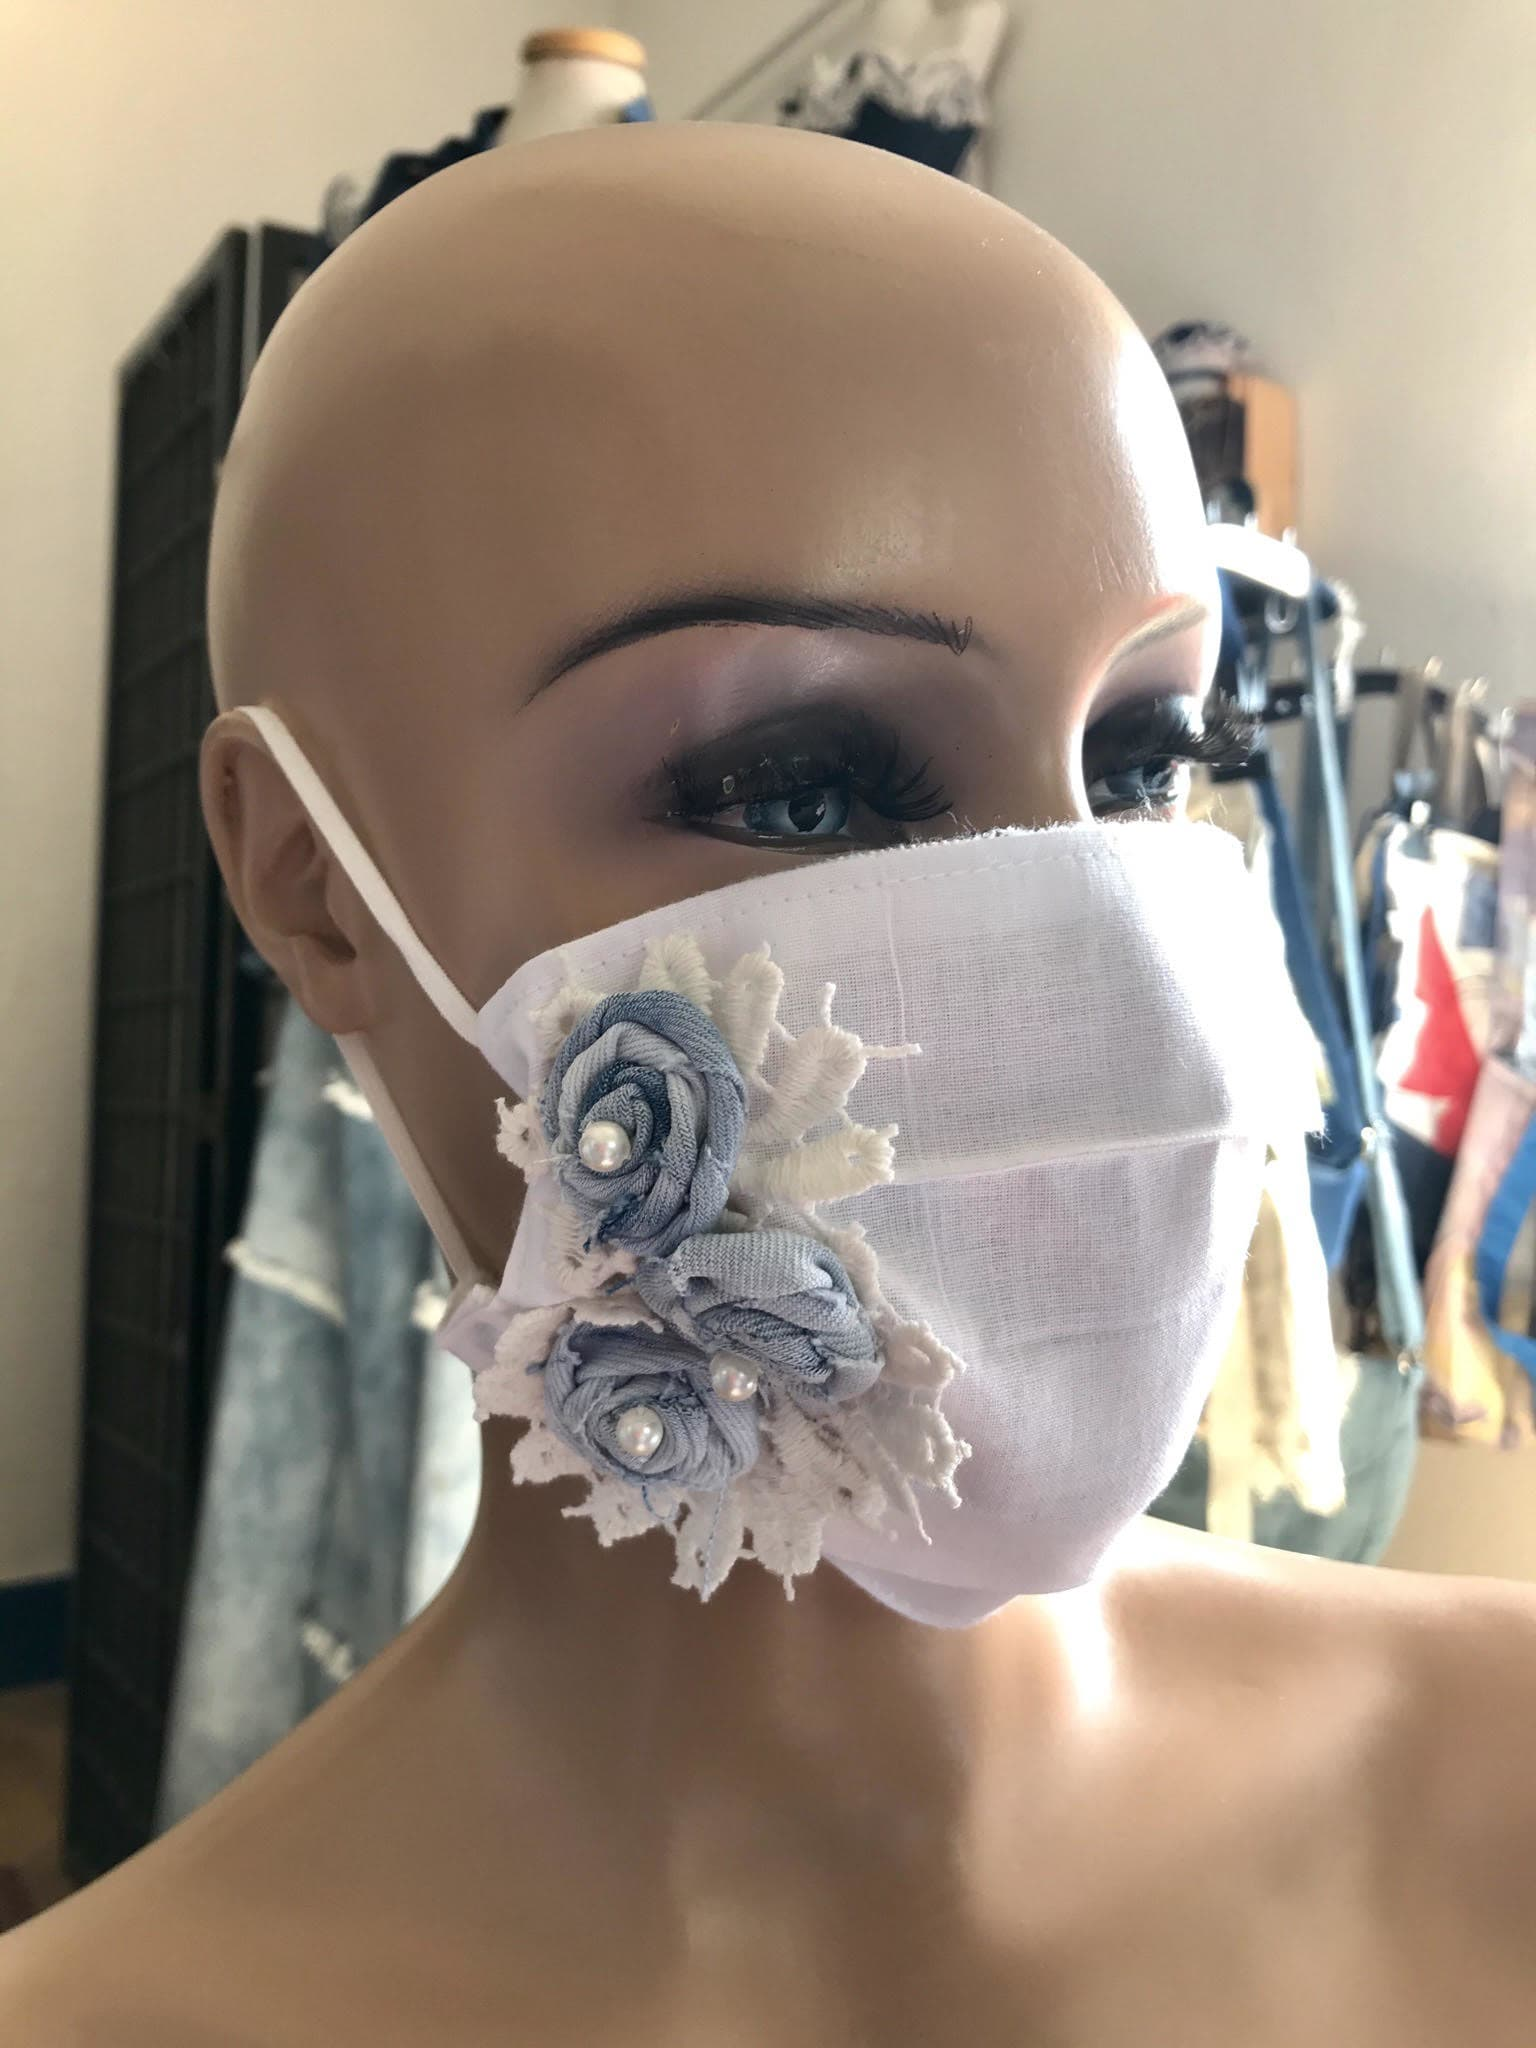 Gondolataim a vírussal kapcsolatban | Rethy Fashion